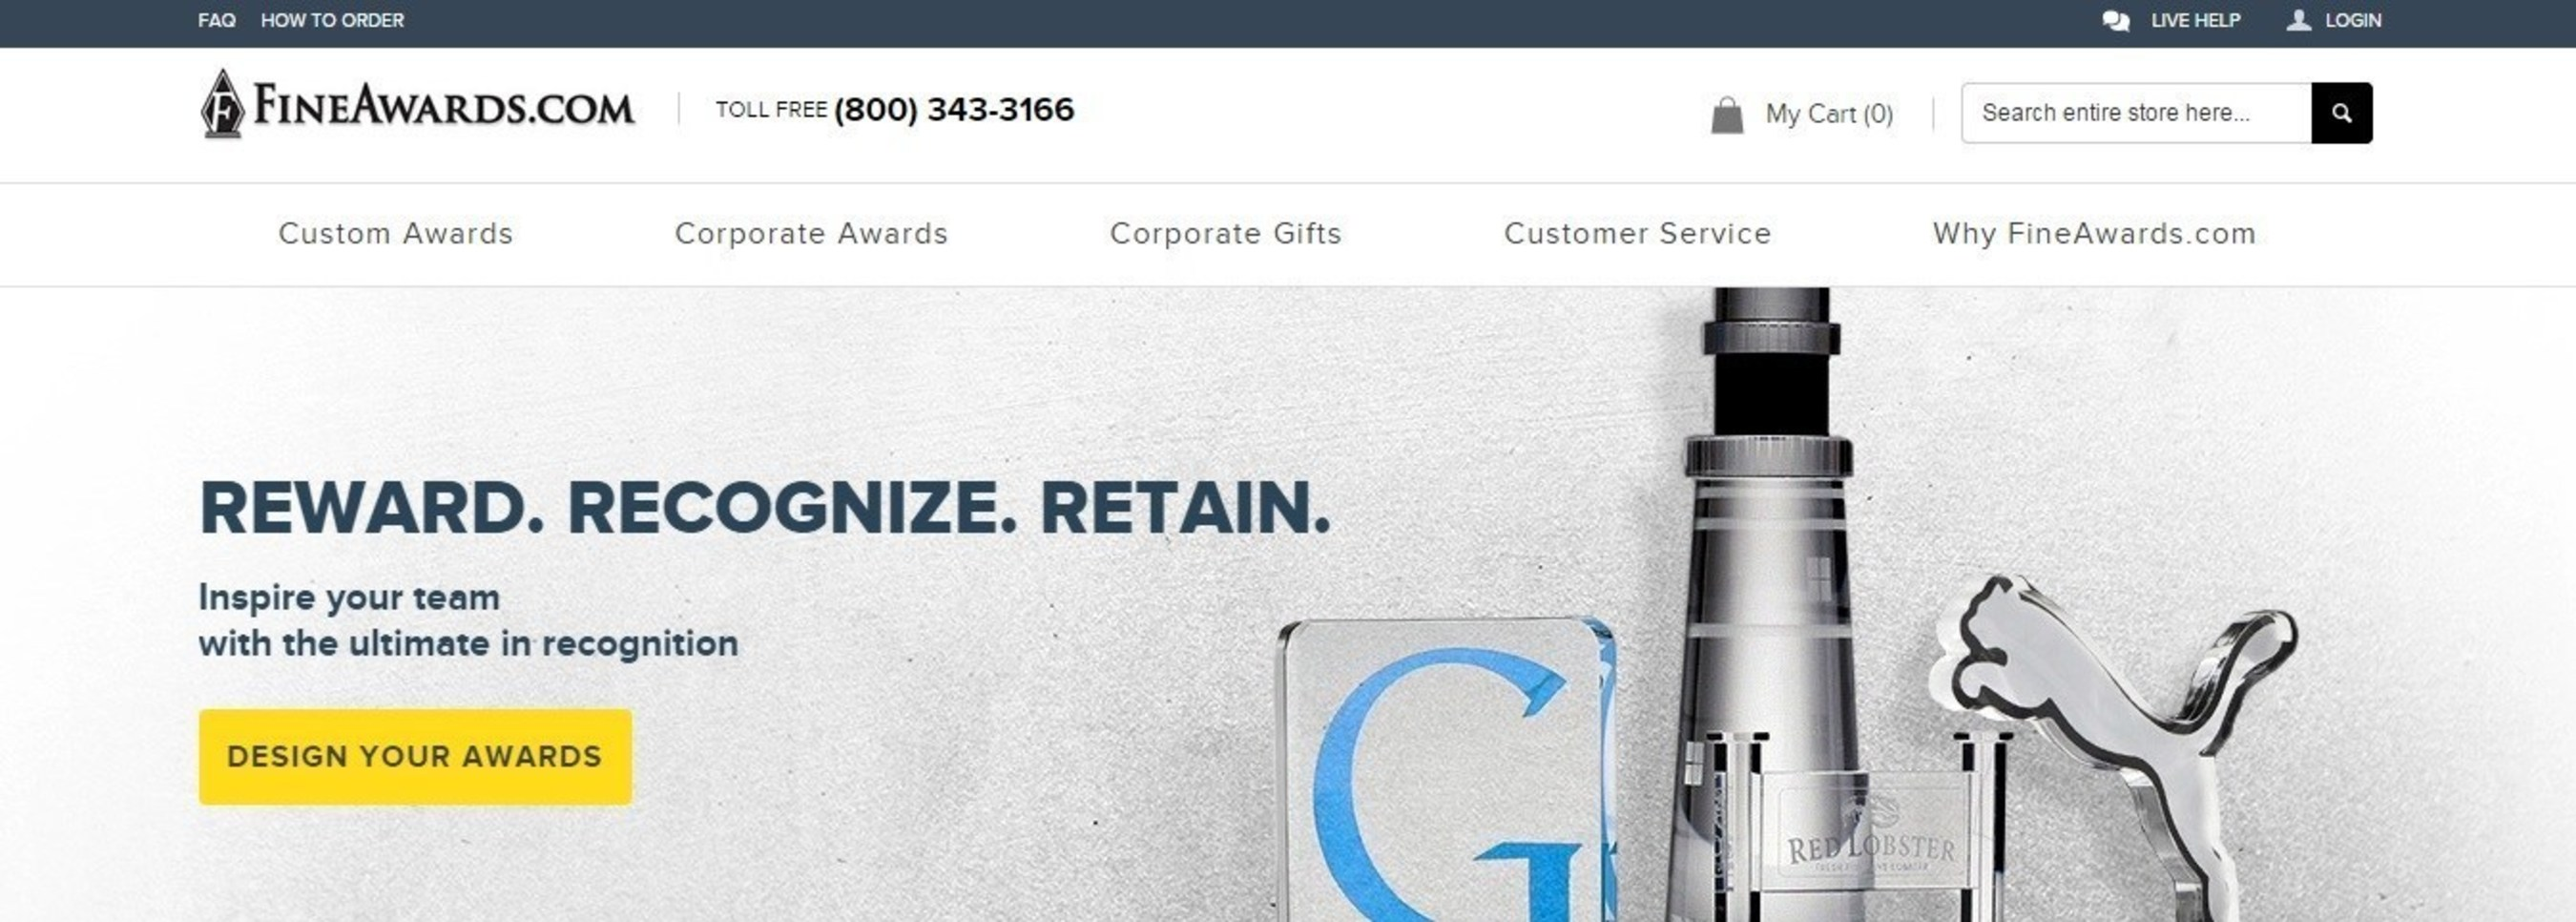 FineAwards.com Launches New Custom Awards Website